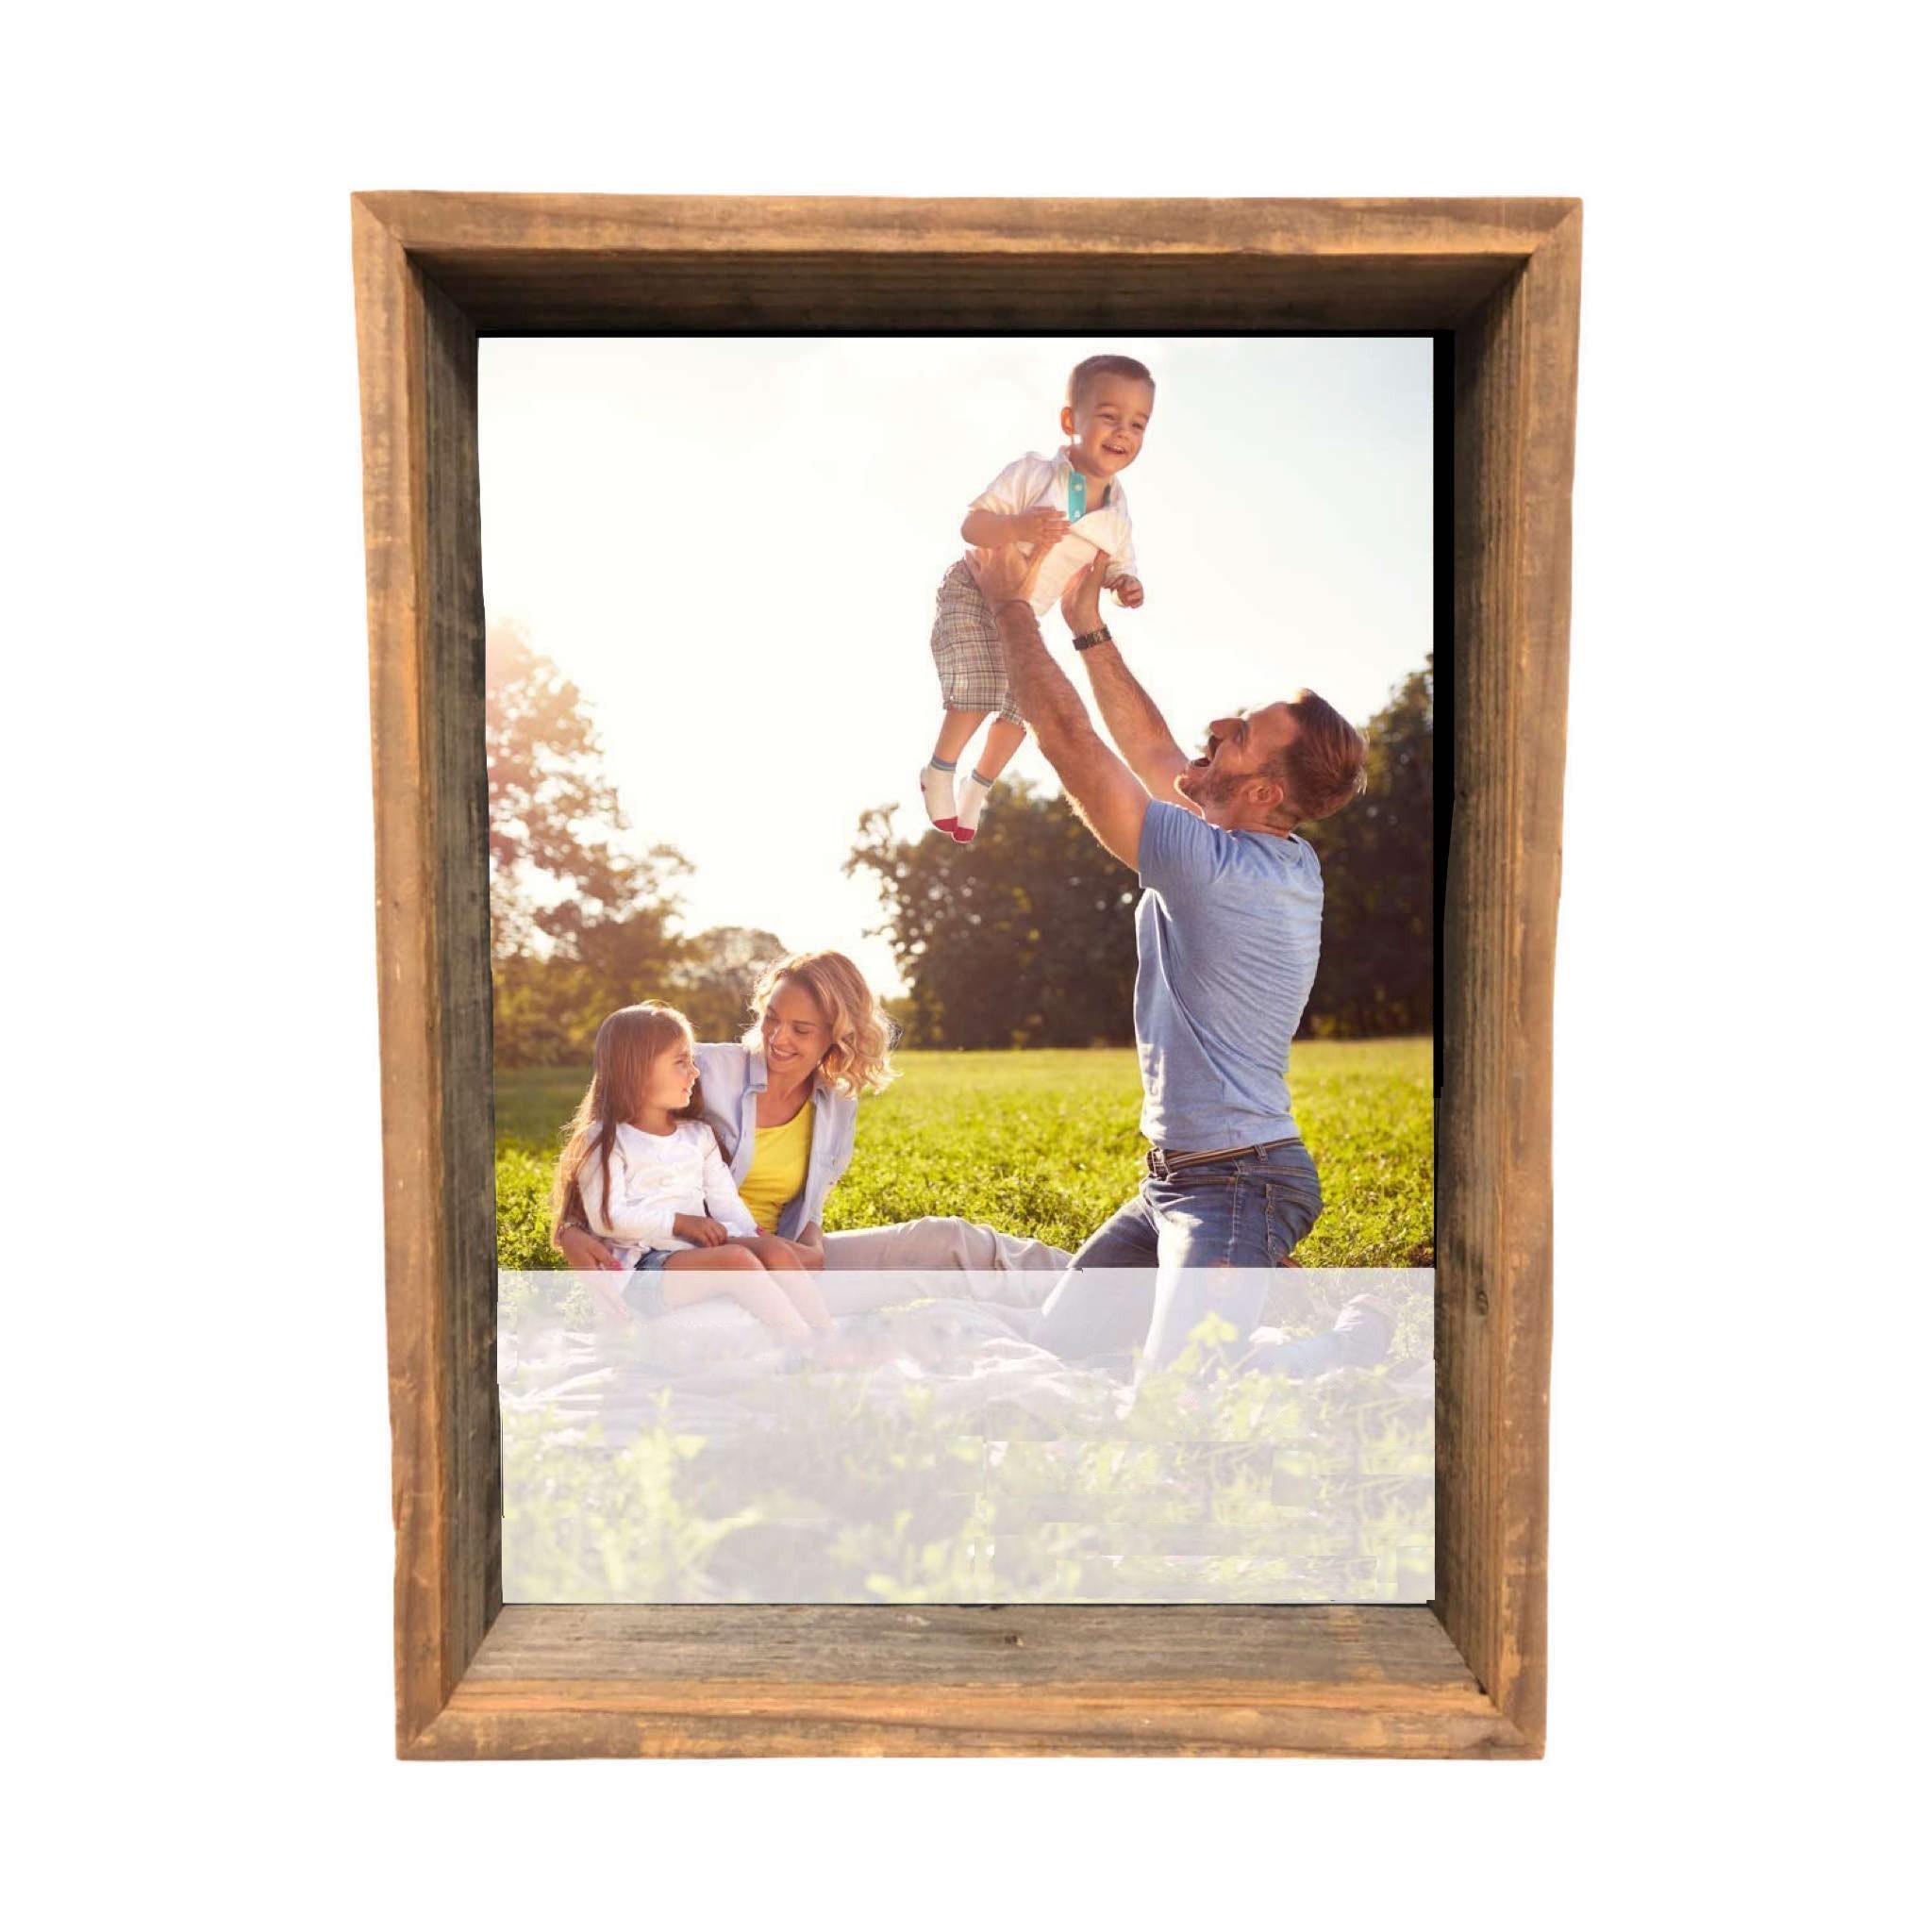 8 x 10 Rustic Farmhouse Gray Shadow Box Frame